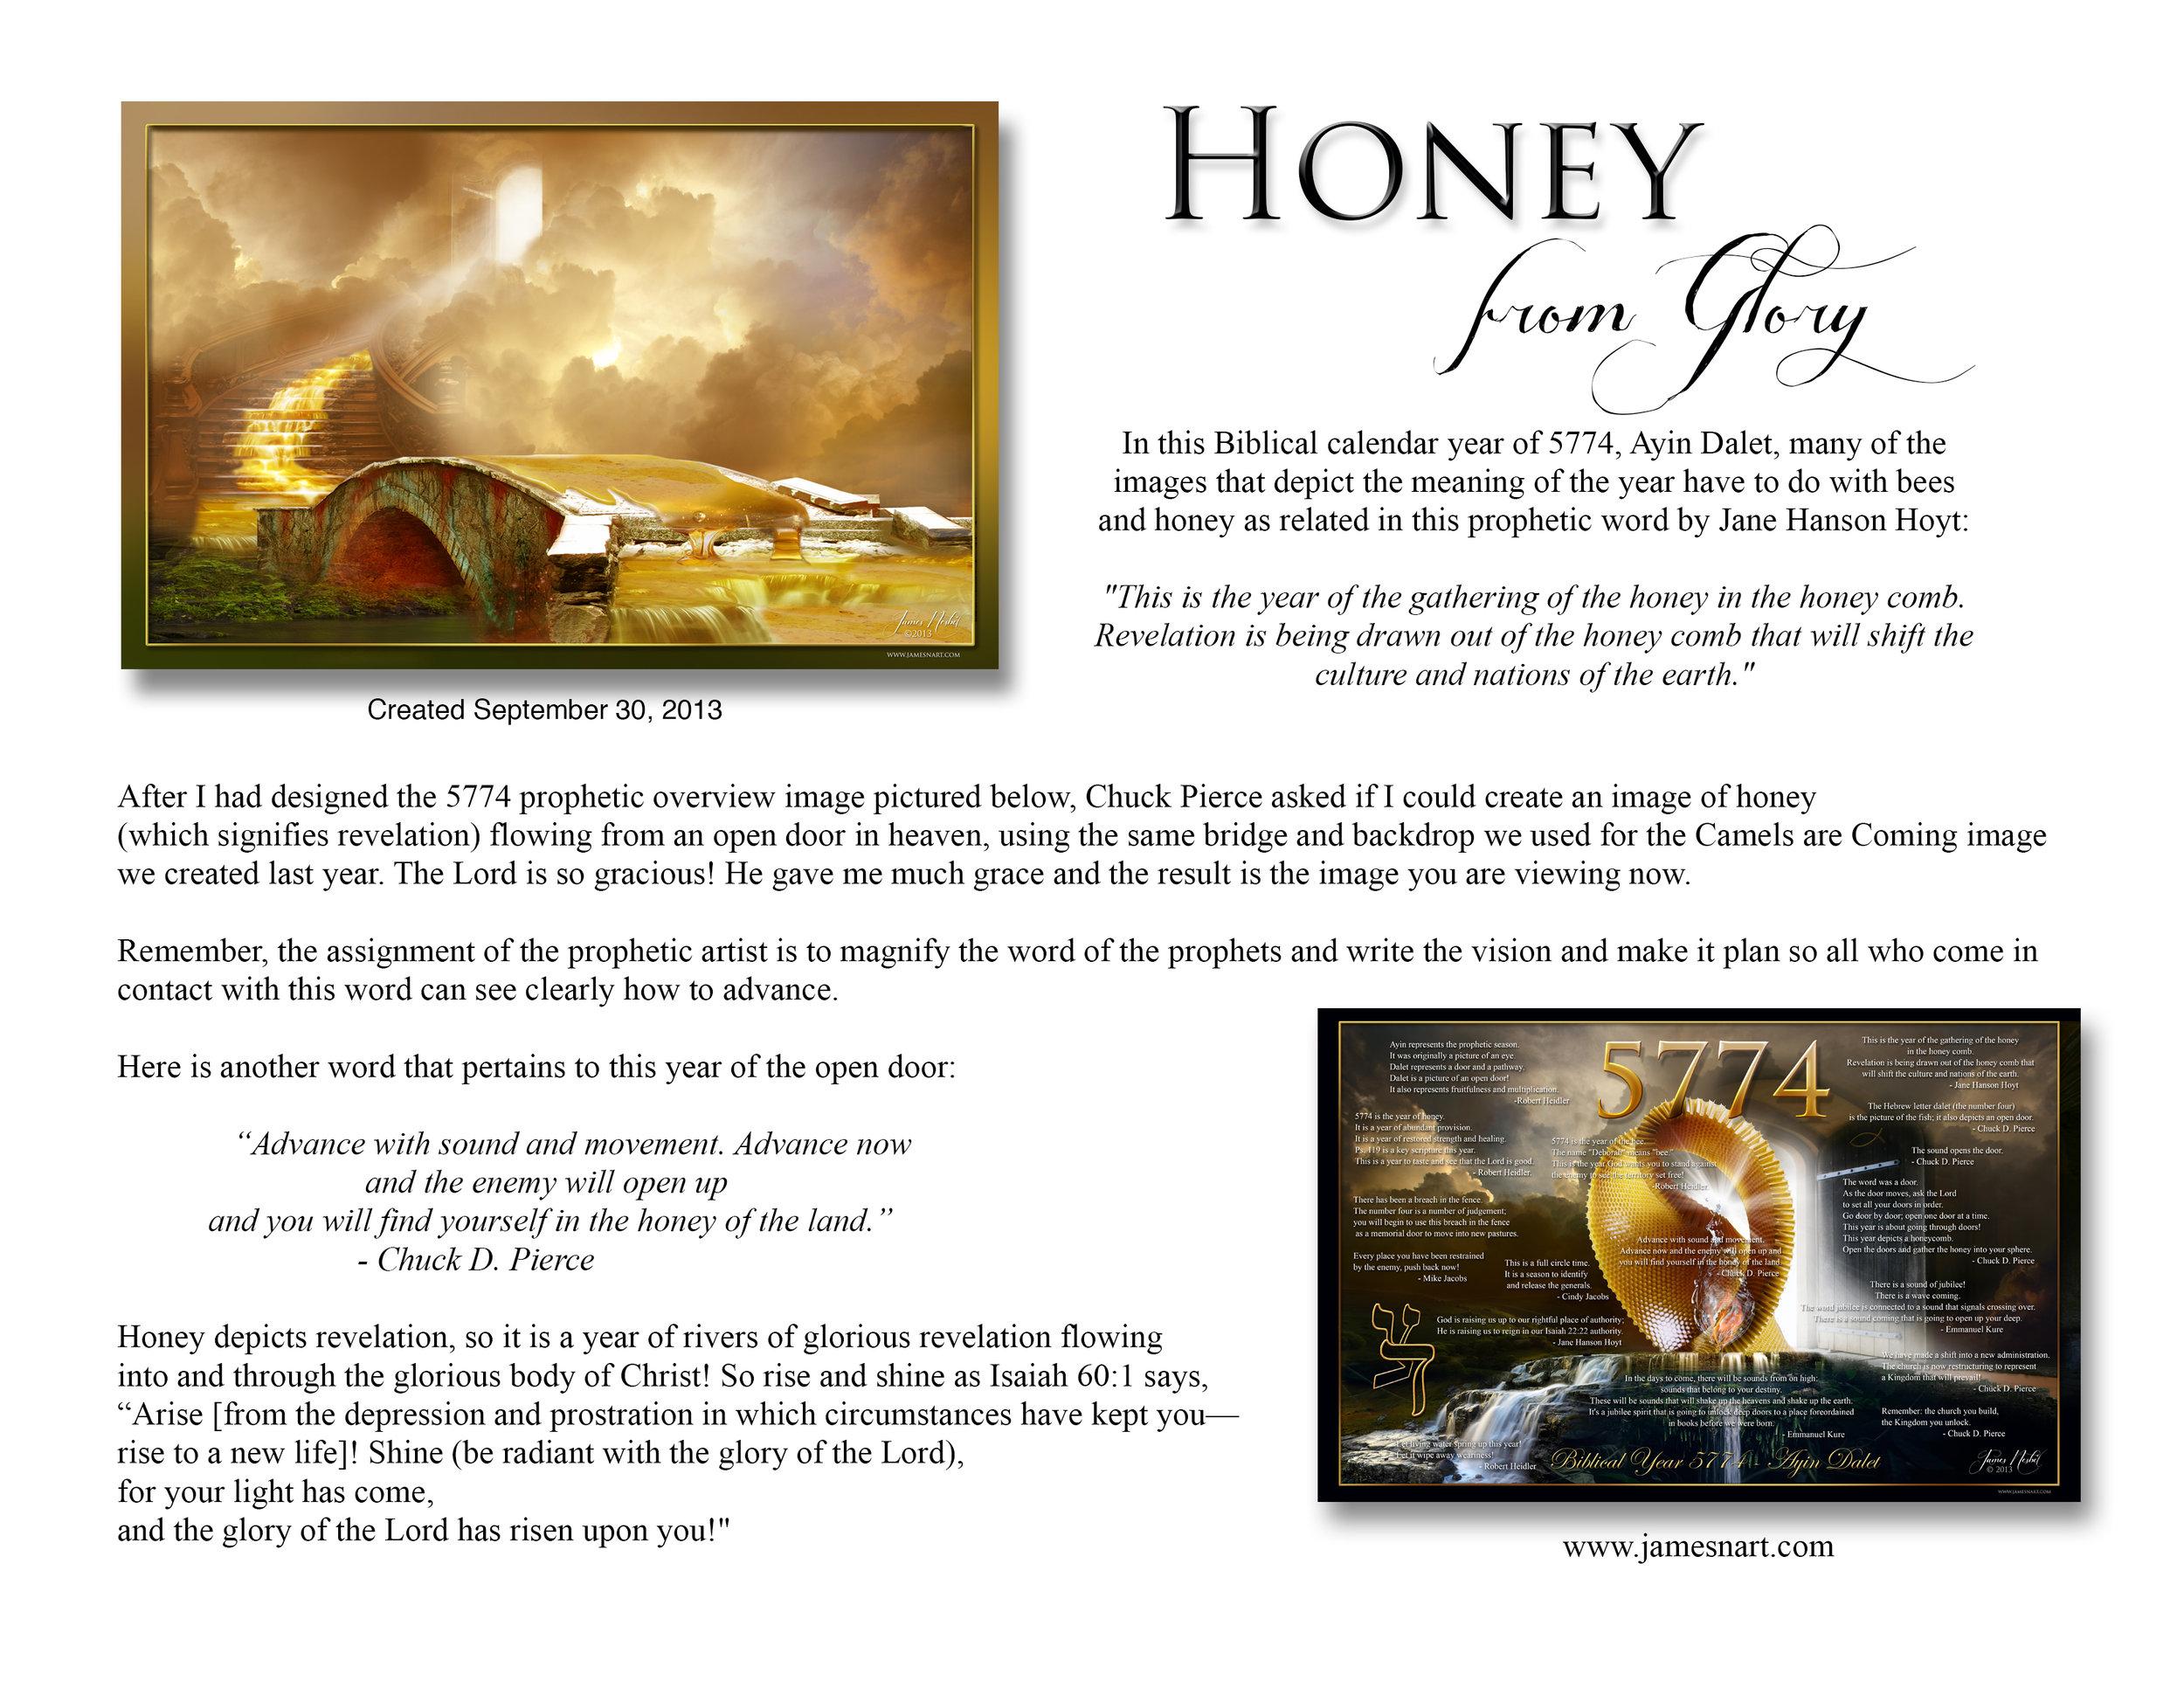 Honey from Glory Descrition.jpg